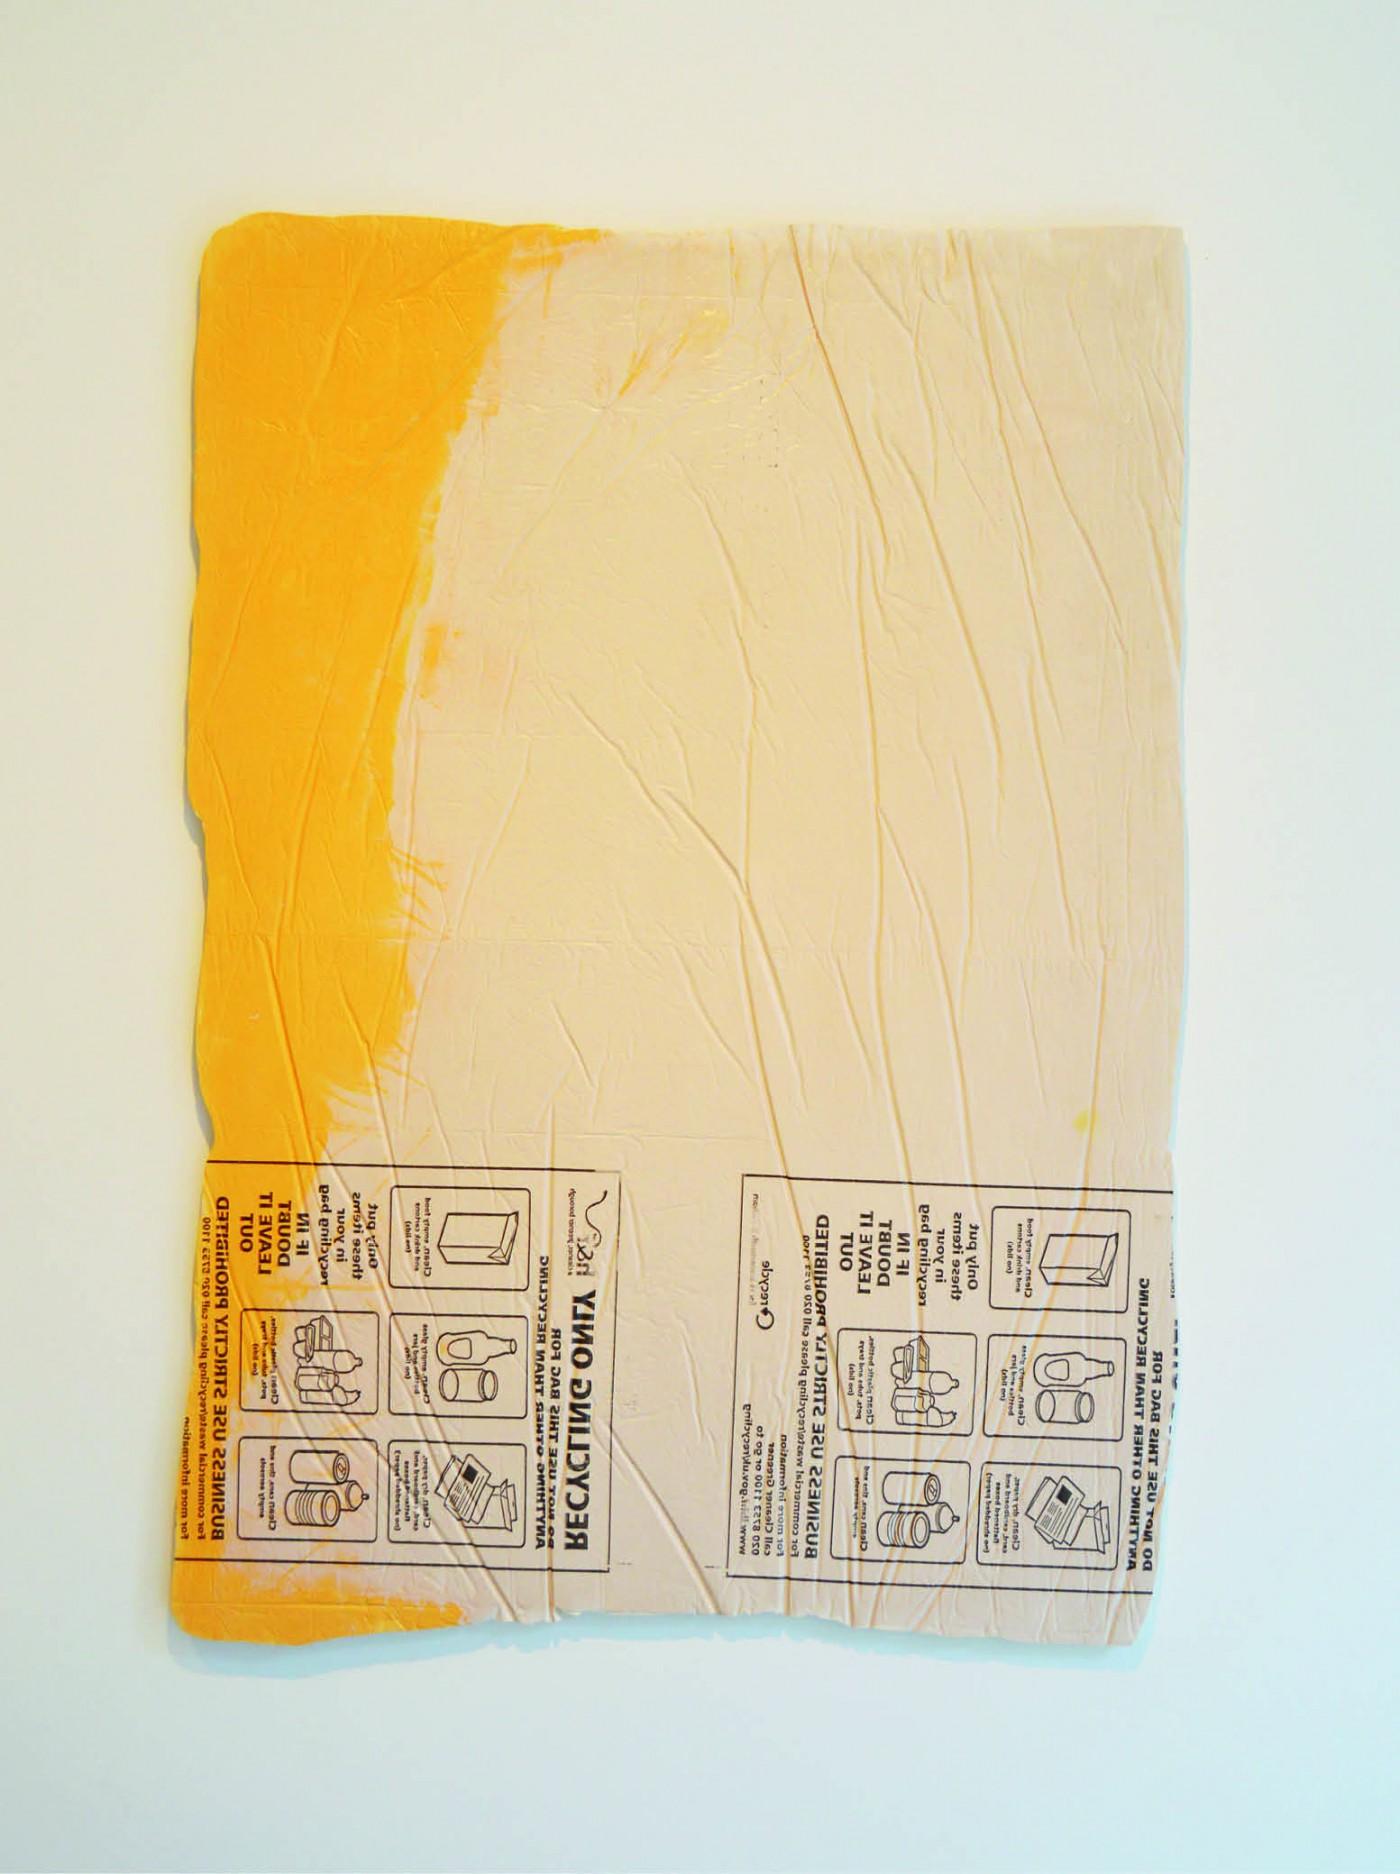 ' PE9 Recycled ', Composite, Pigment, Acrylic. 116 x 82 cm | 2015